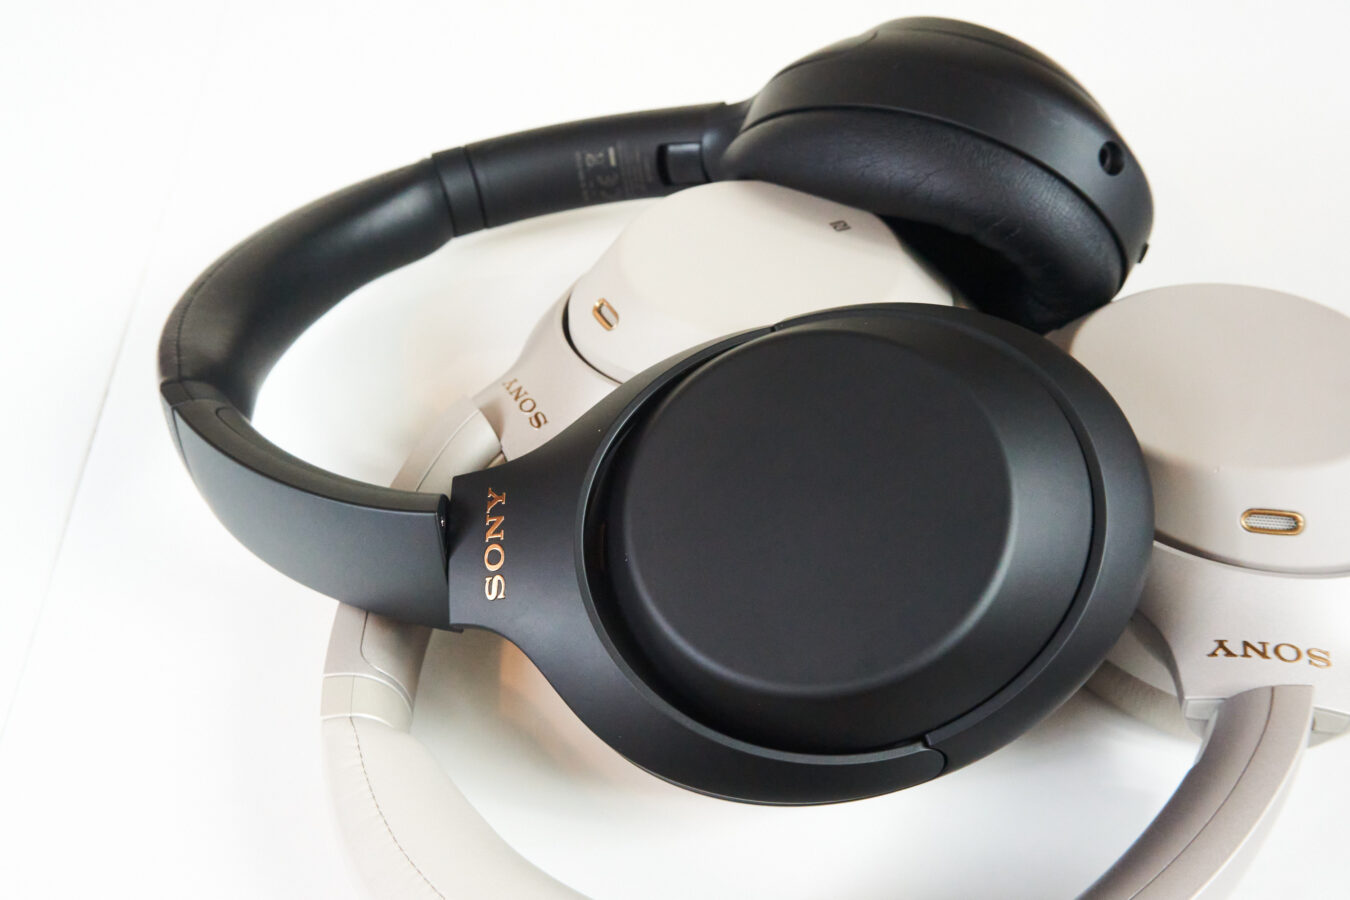 Sony WH-1000XM4 fot. Tabletowo.pl